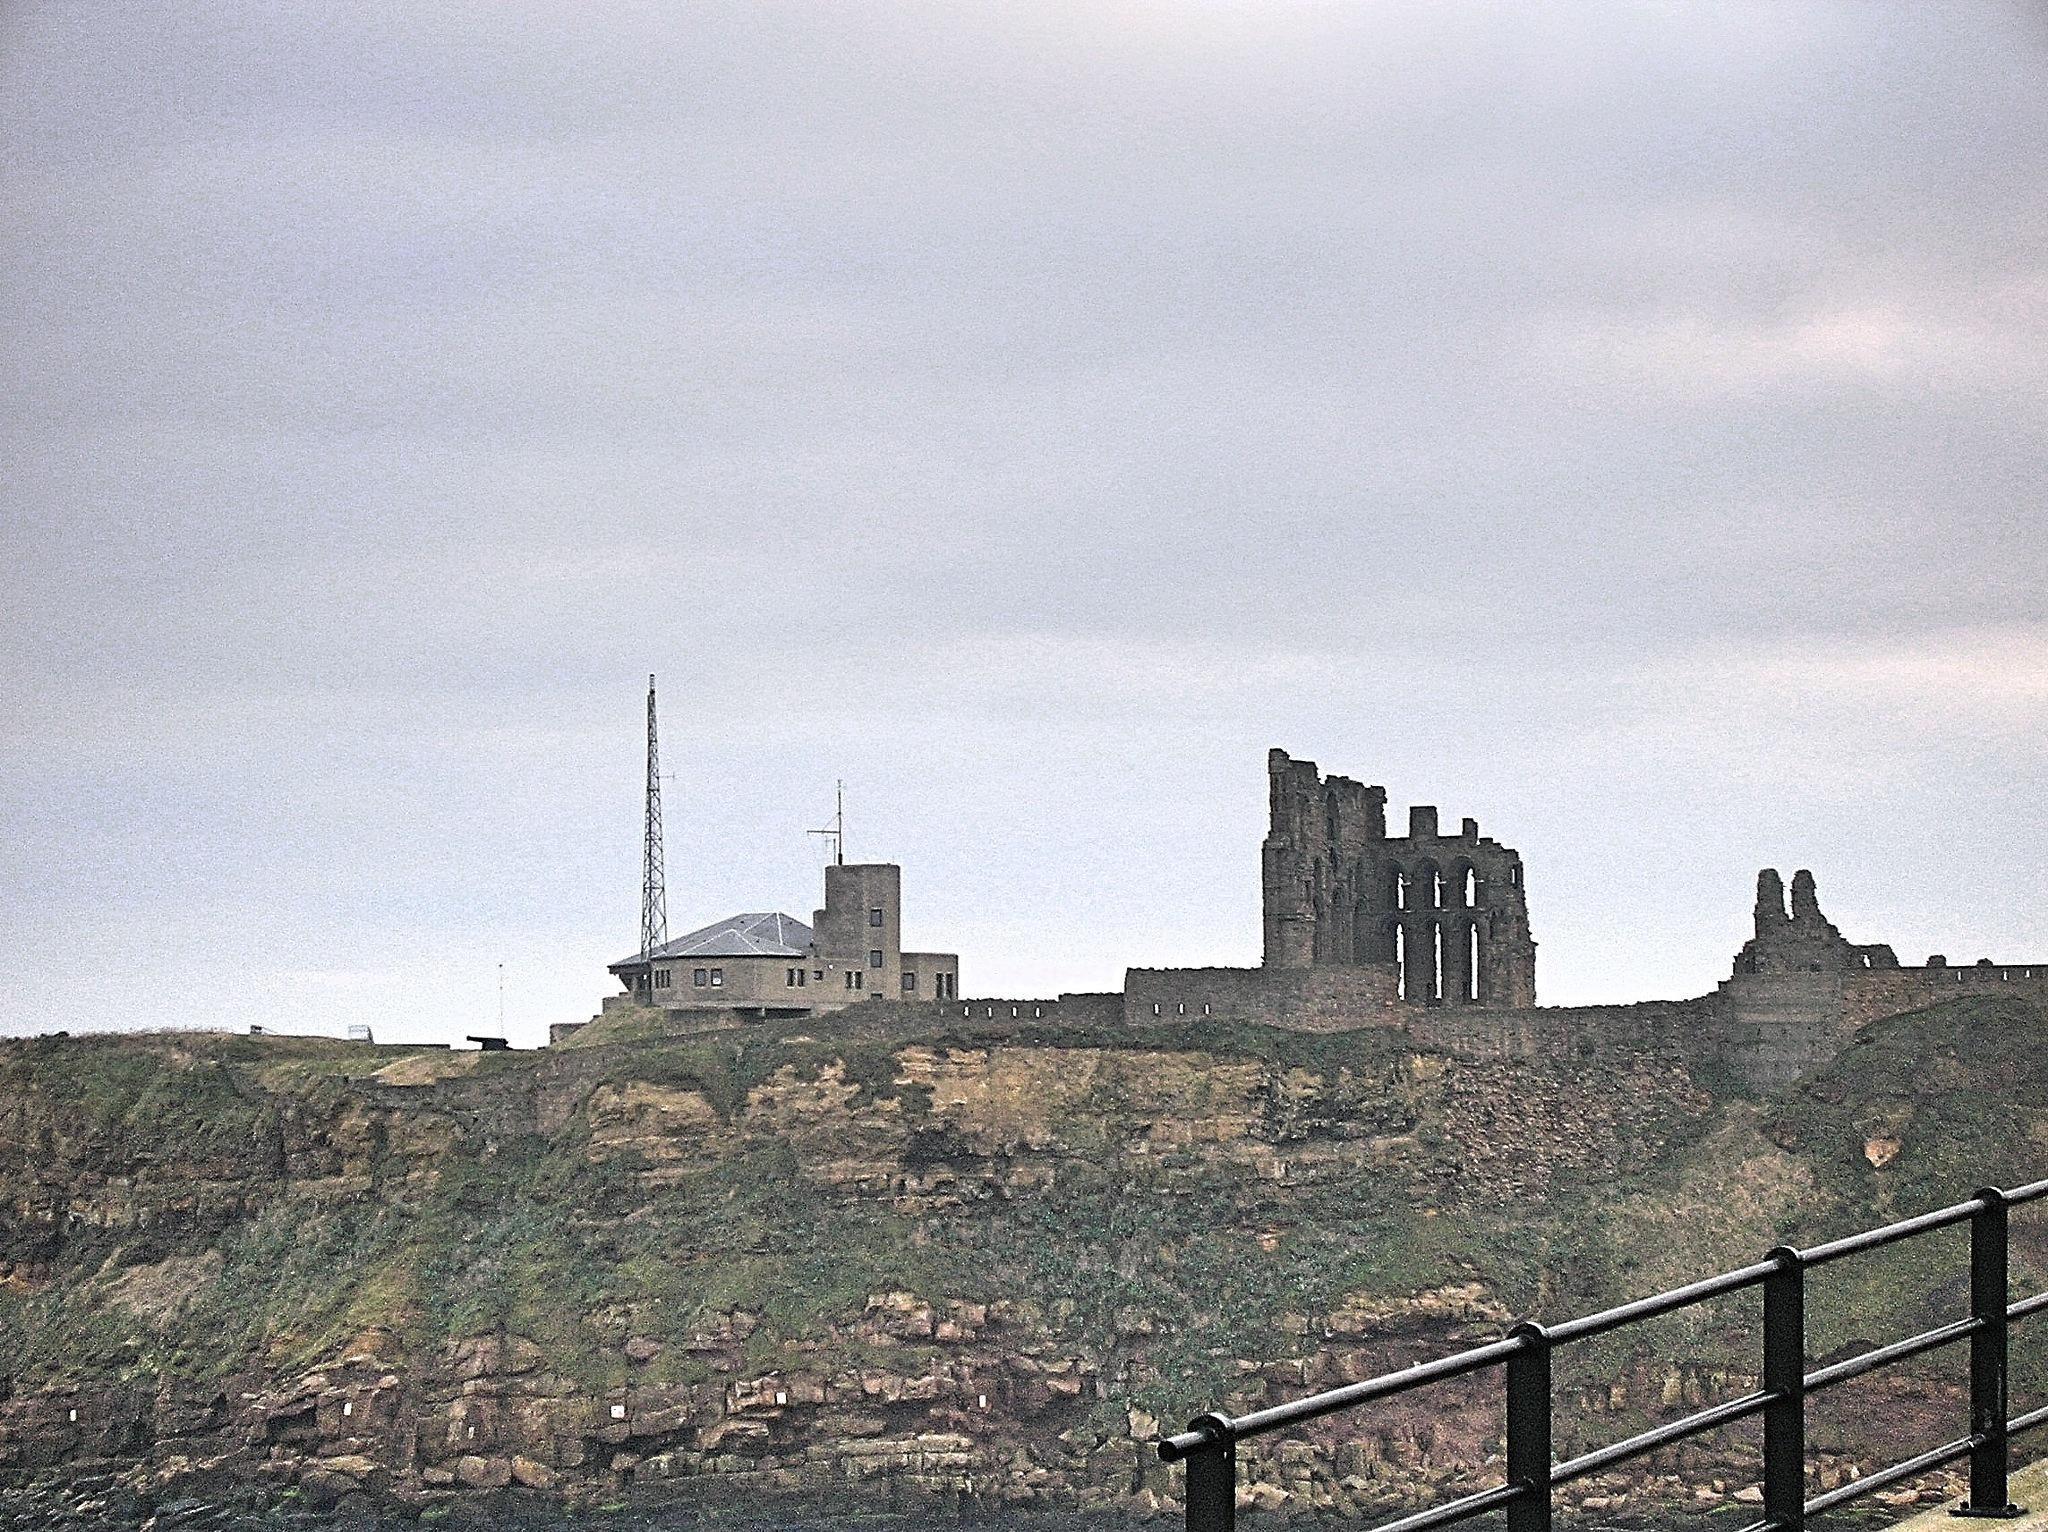 Tynemouth Priory by Craig Neve